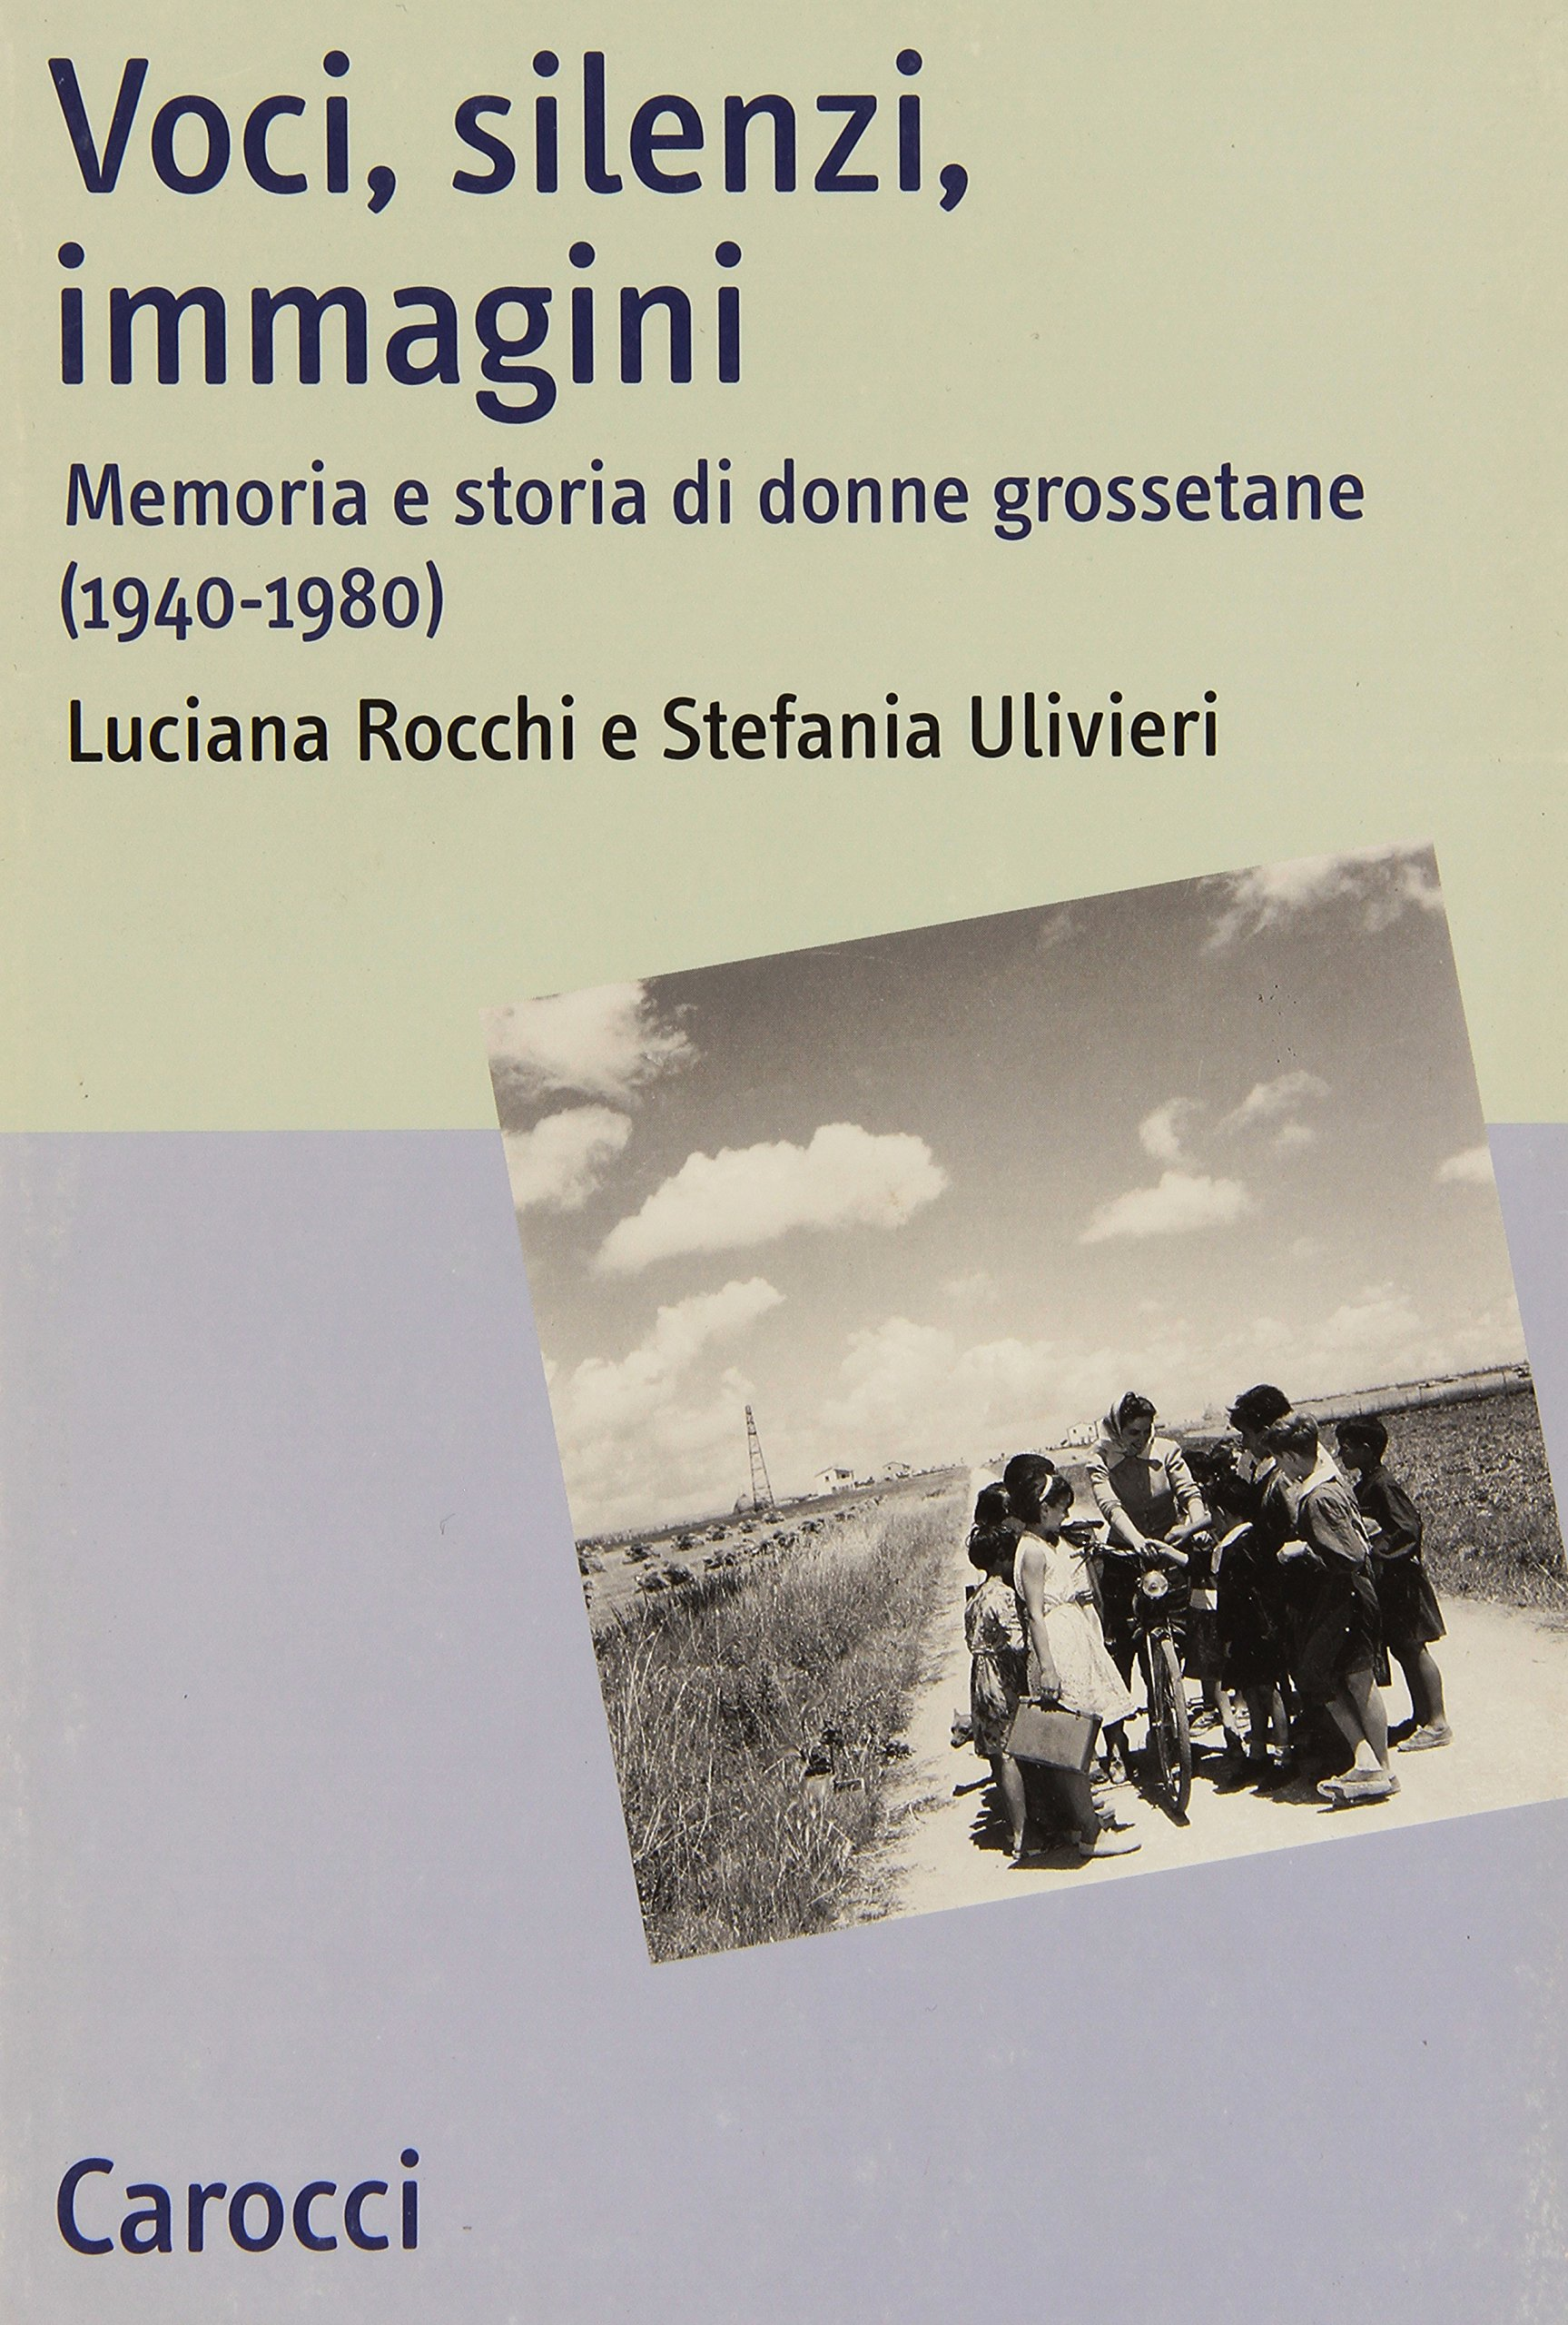 Voci, silenzi, immagini. memoria e storia di donne grossetane, a cura di uciana Rocchi e Stefania Ulivieri, Carocci, Roma 2004